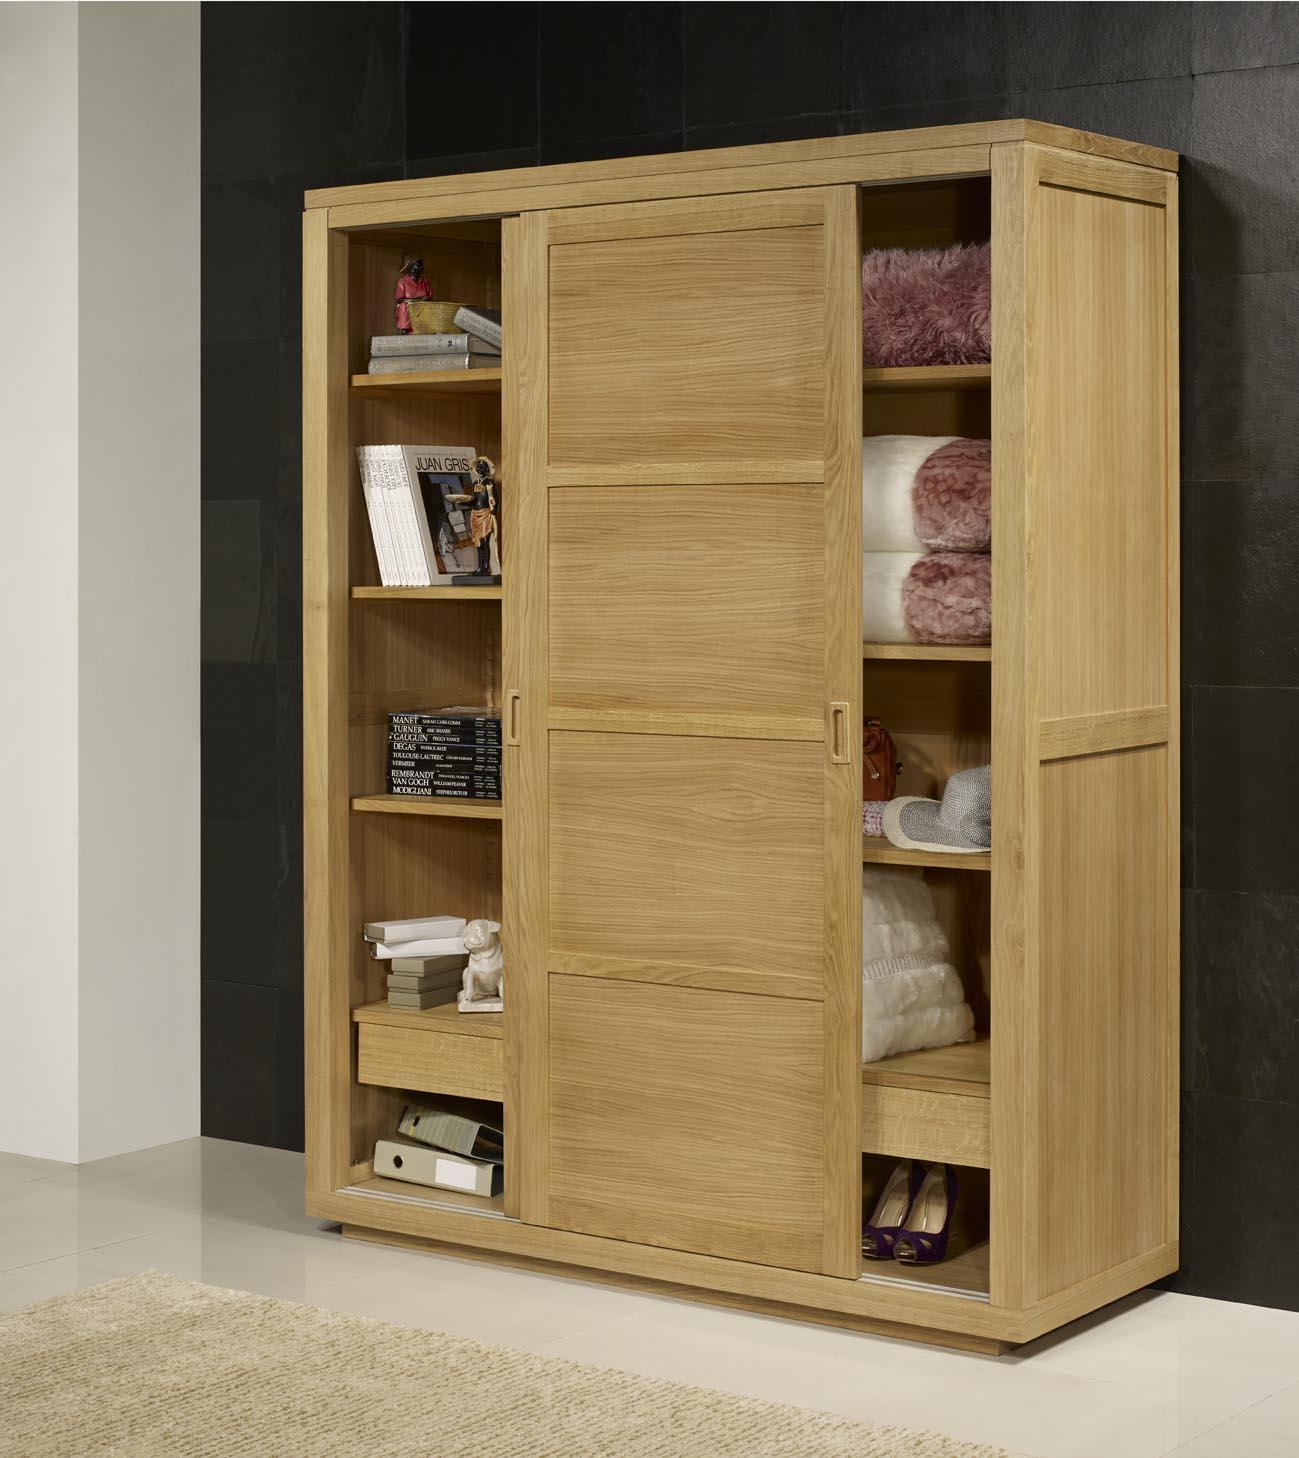 porte bois massif contemporain. Black Bedroom Furniture Sets. Home Design Ideas